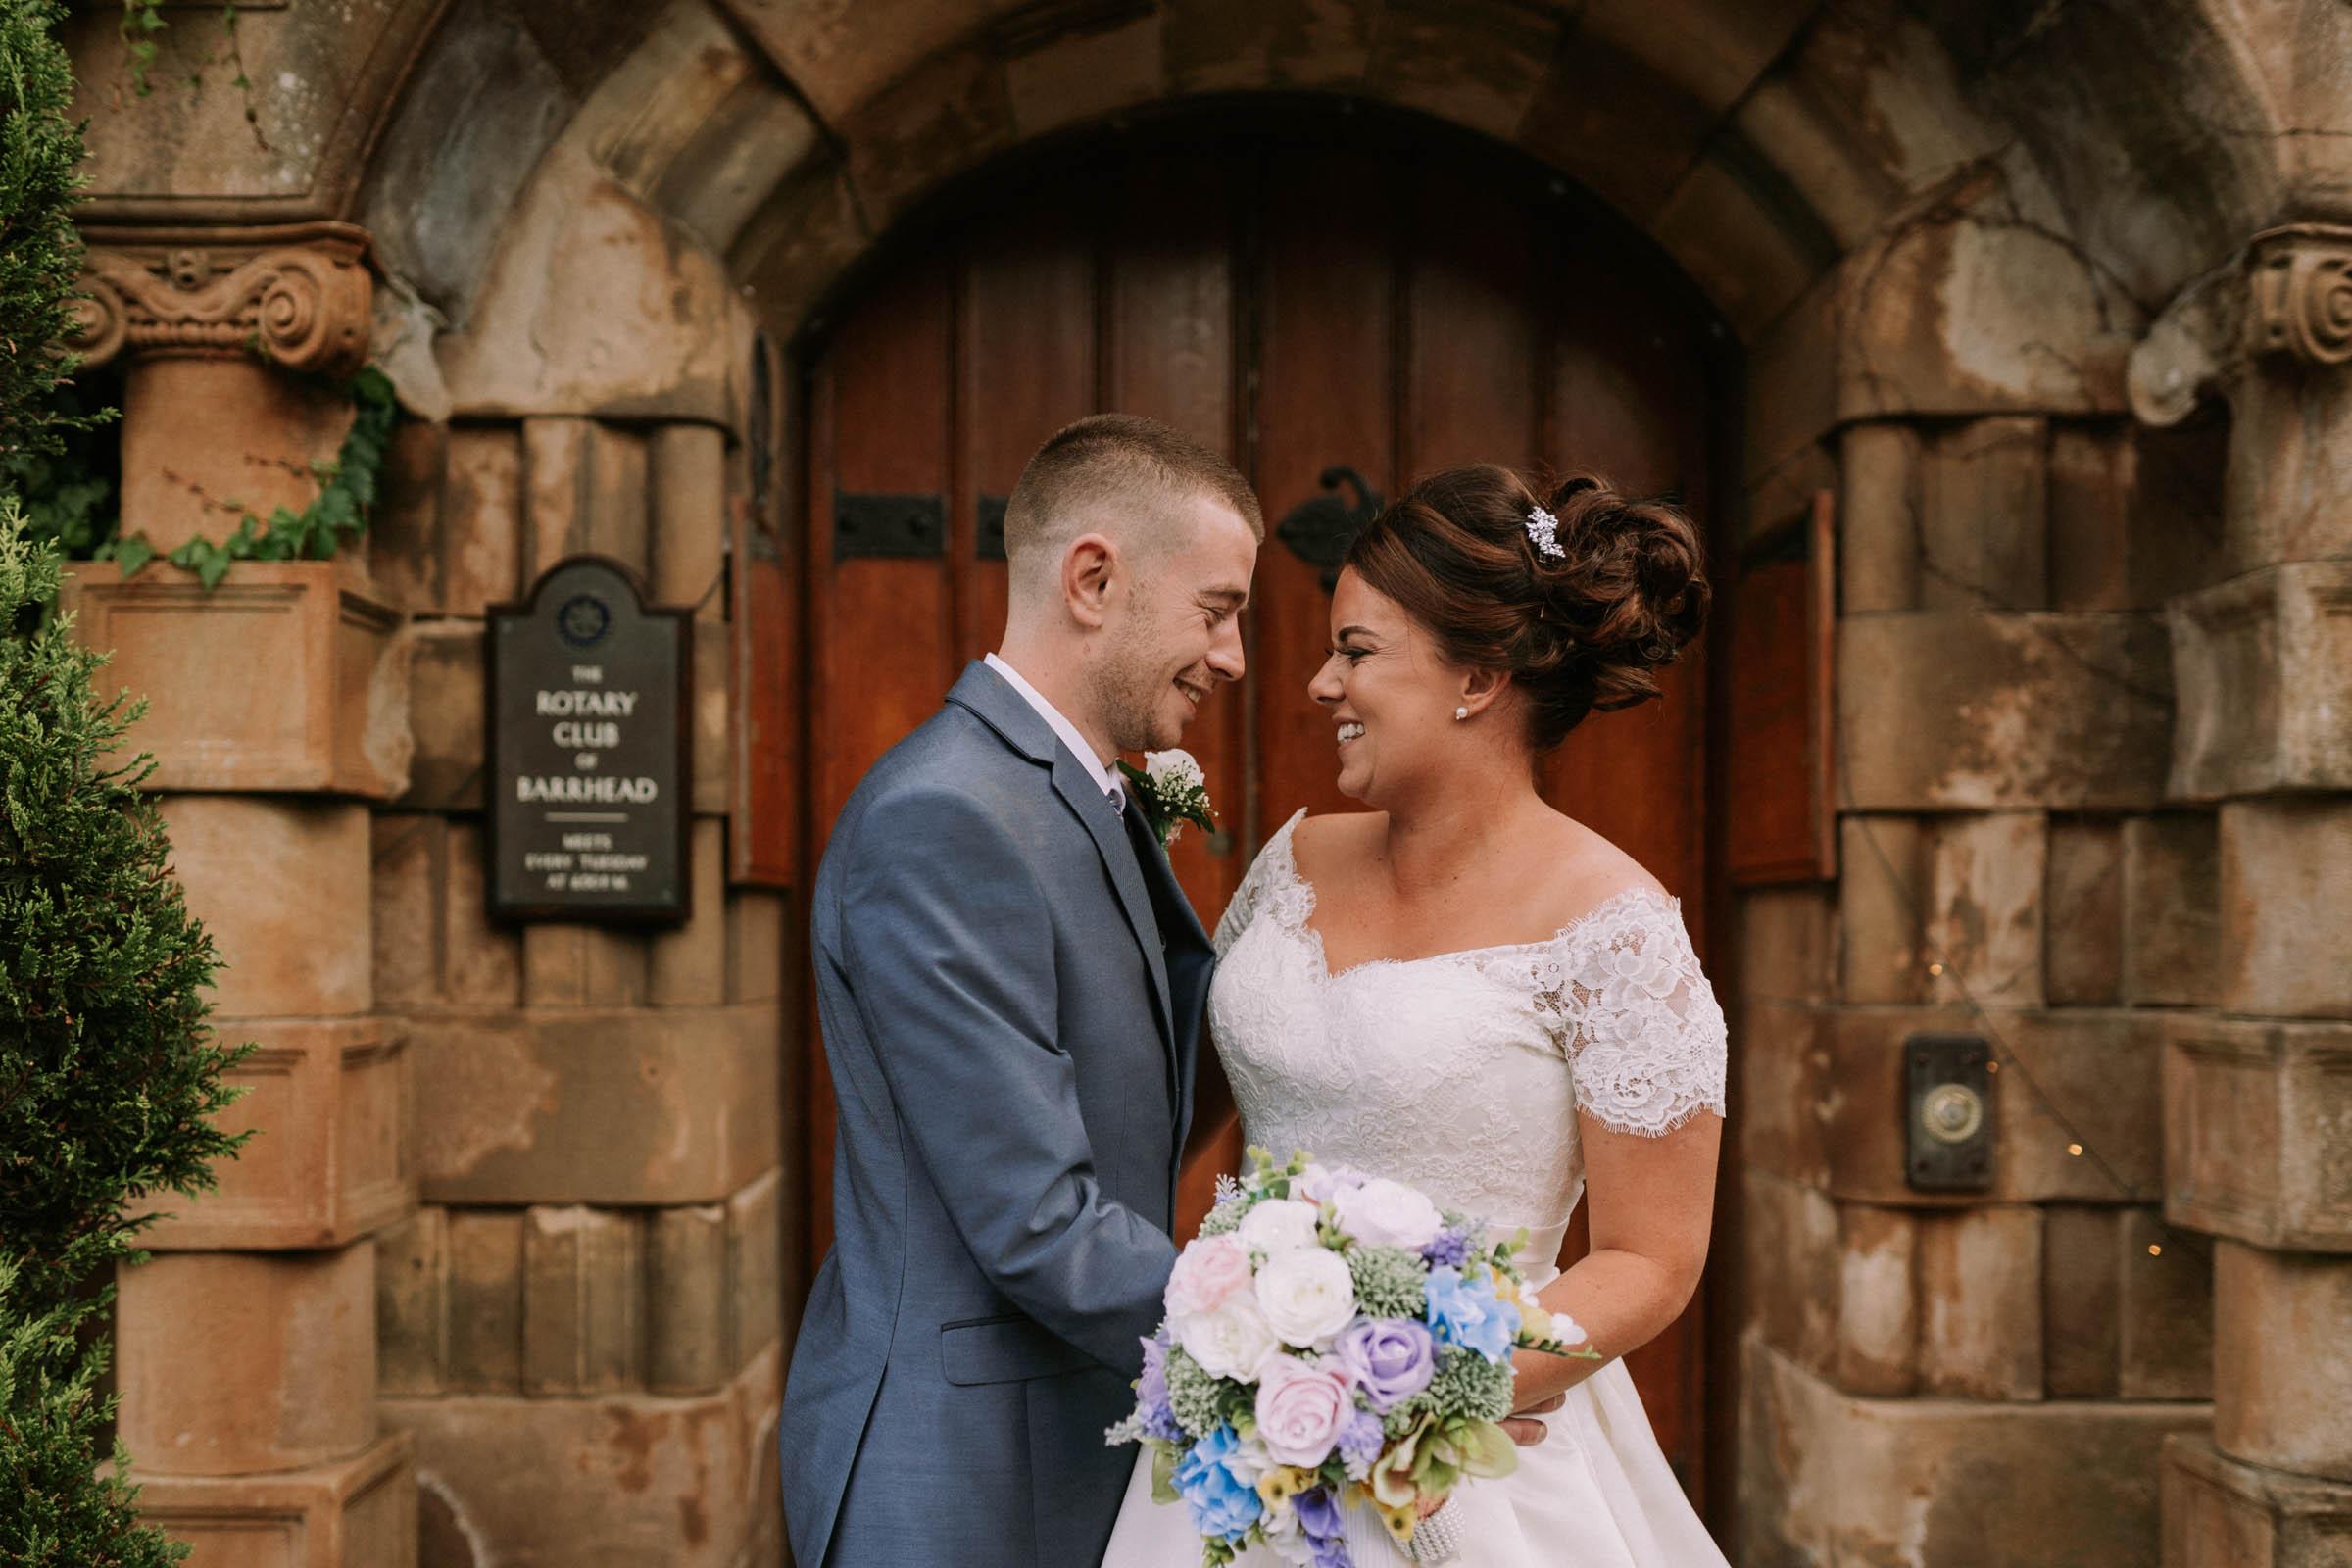 Dalmeny-Park-Glasgow-Wedding-Dearly-Photography-Scotland (40 of 75).jpg